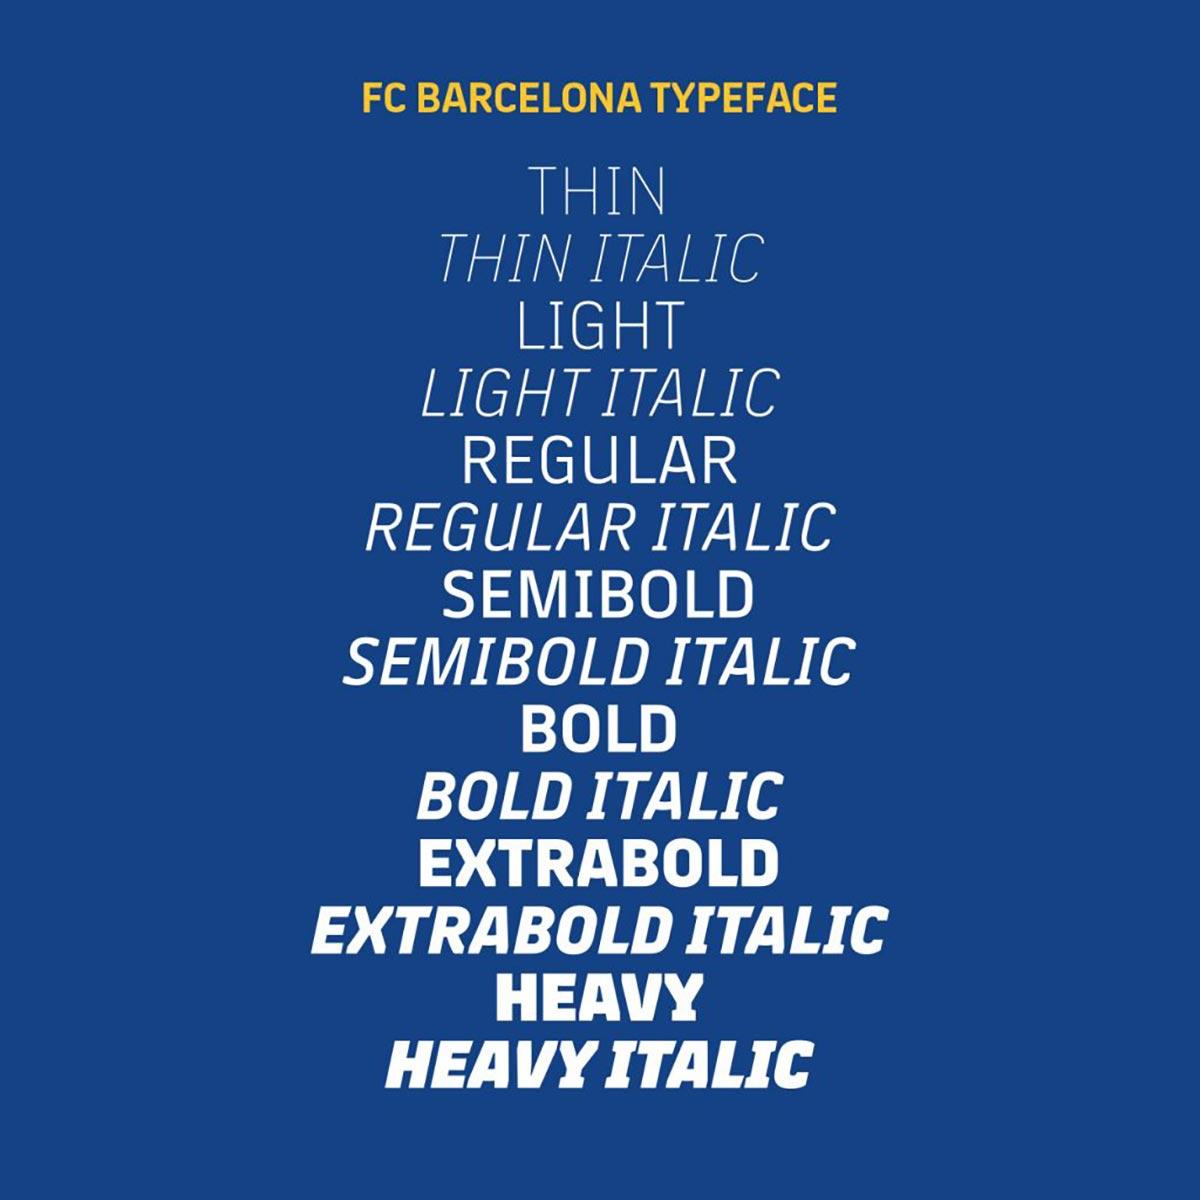 Nueva tipografias del Barsa